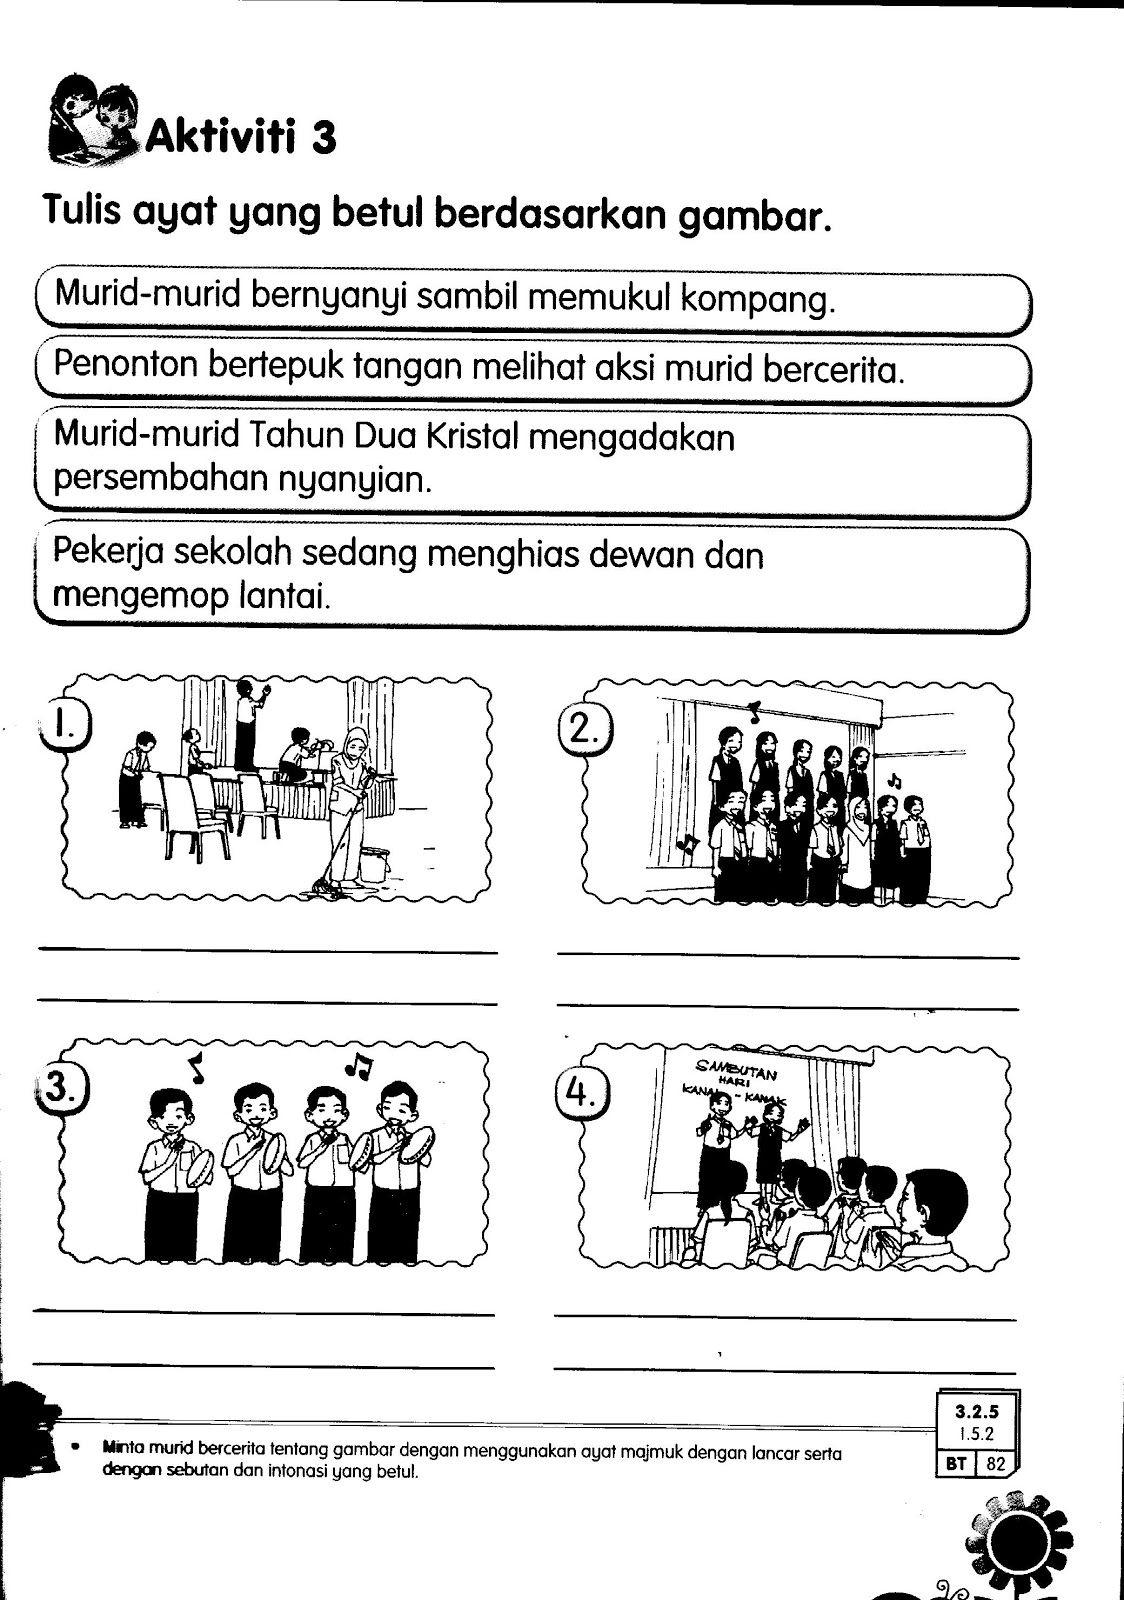 Latihan Bahasa Malaysia Tahun 1 Google Search Bm Thn 1